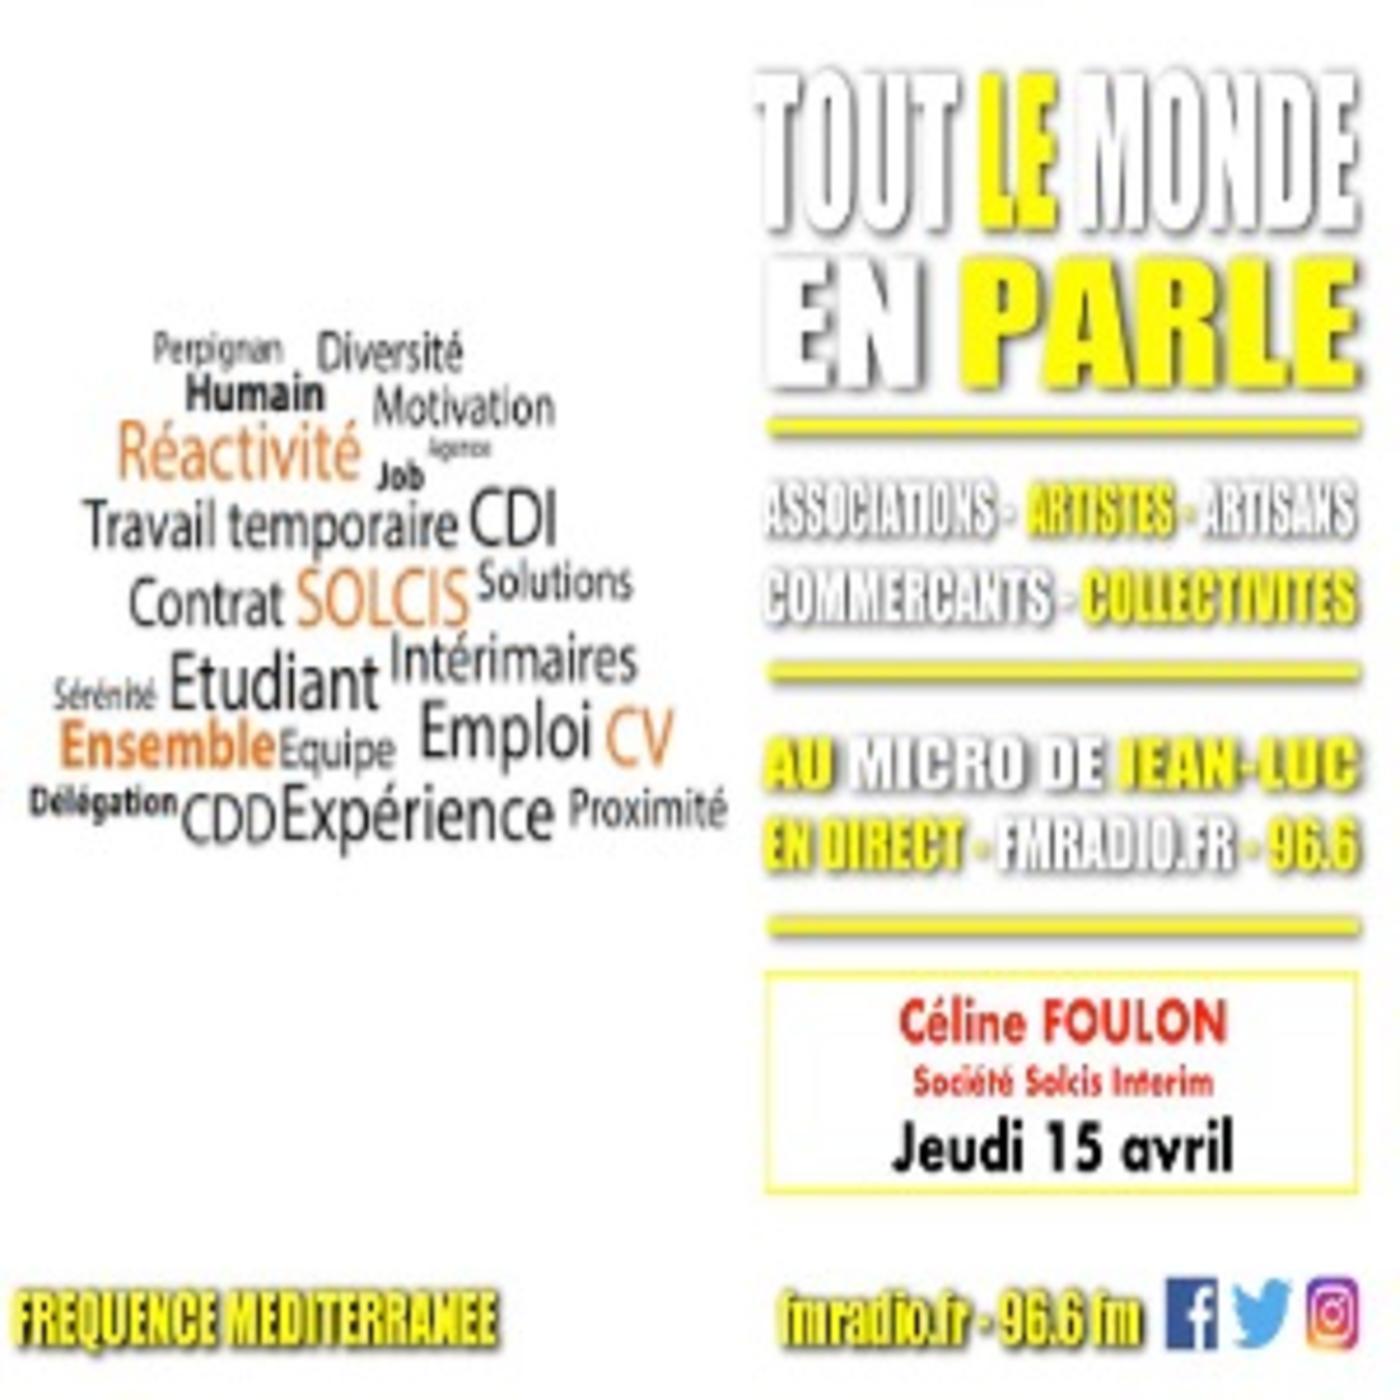 Invitée - Céline Foulon ( Agence Solcis Intérim )